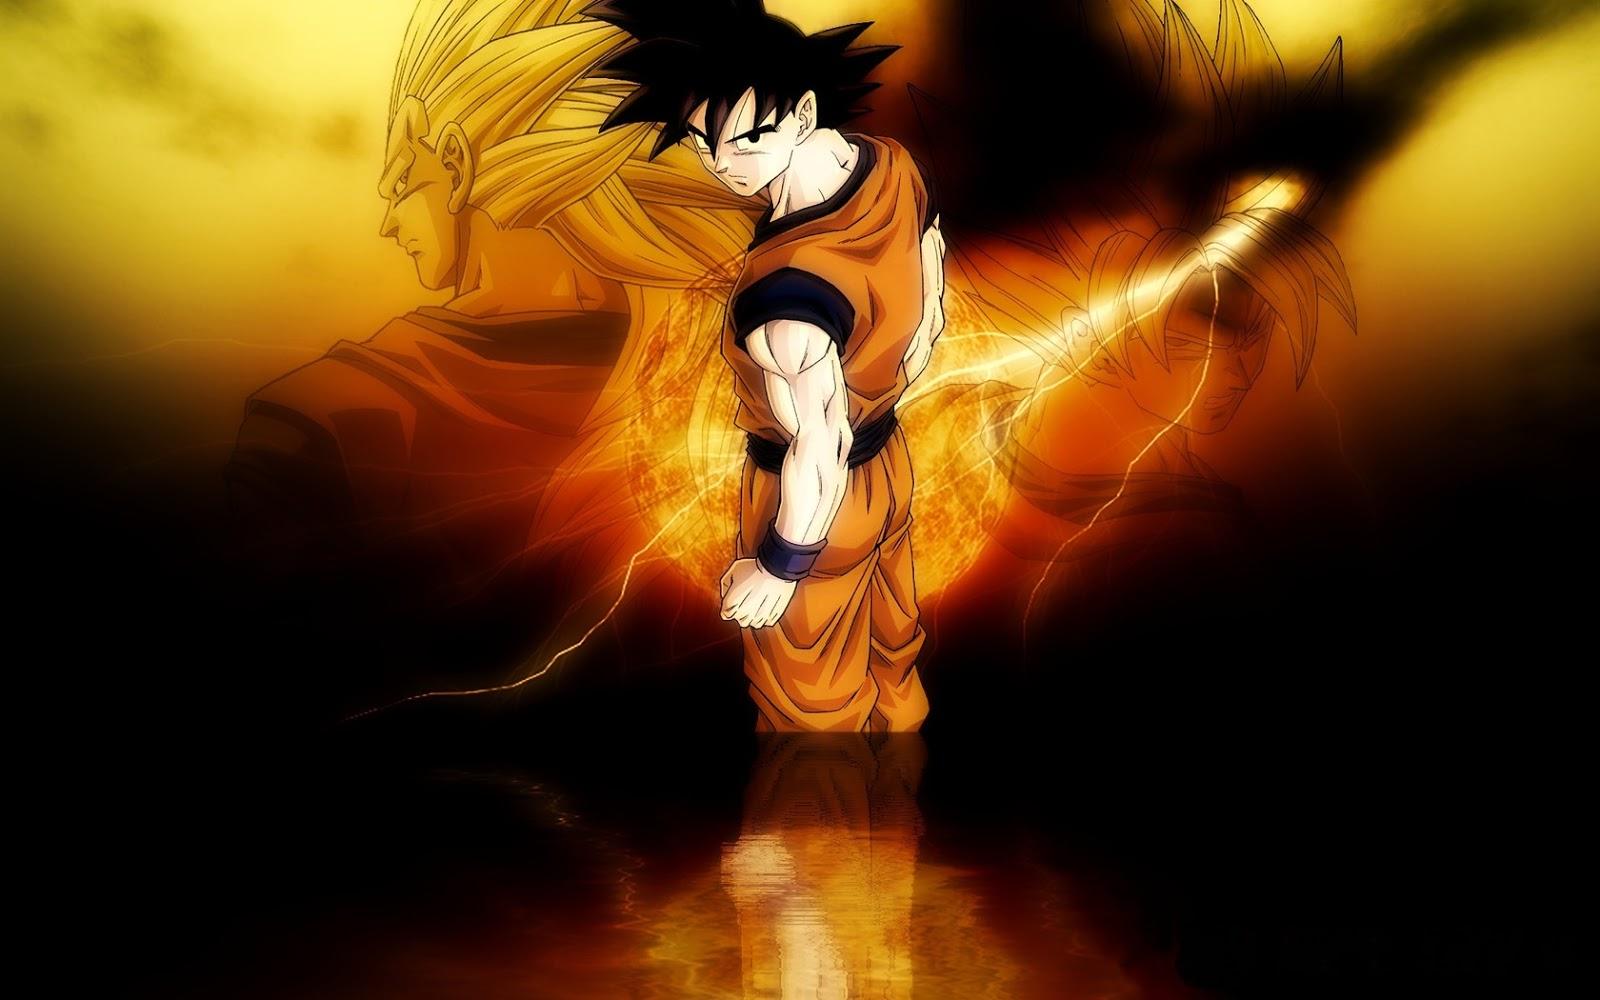 Goku - Super Goku - Fondos de Pantalla HD - Wallpapers HD